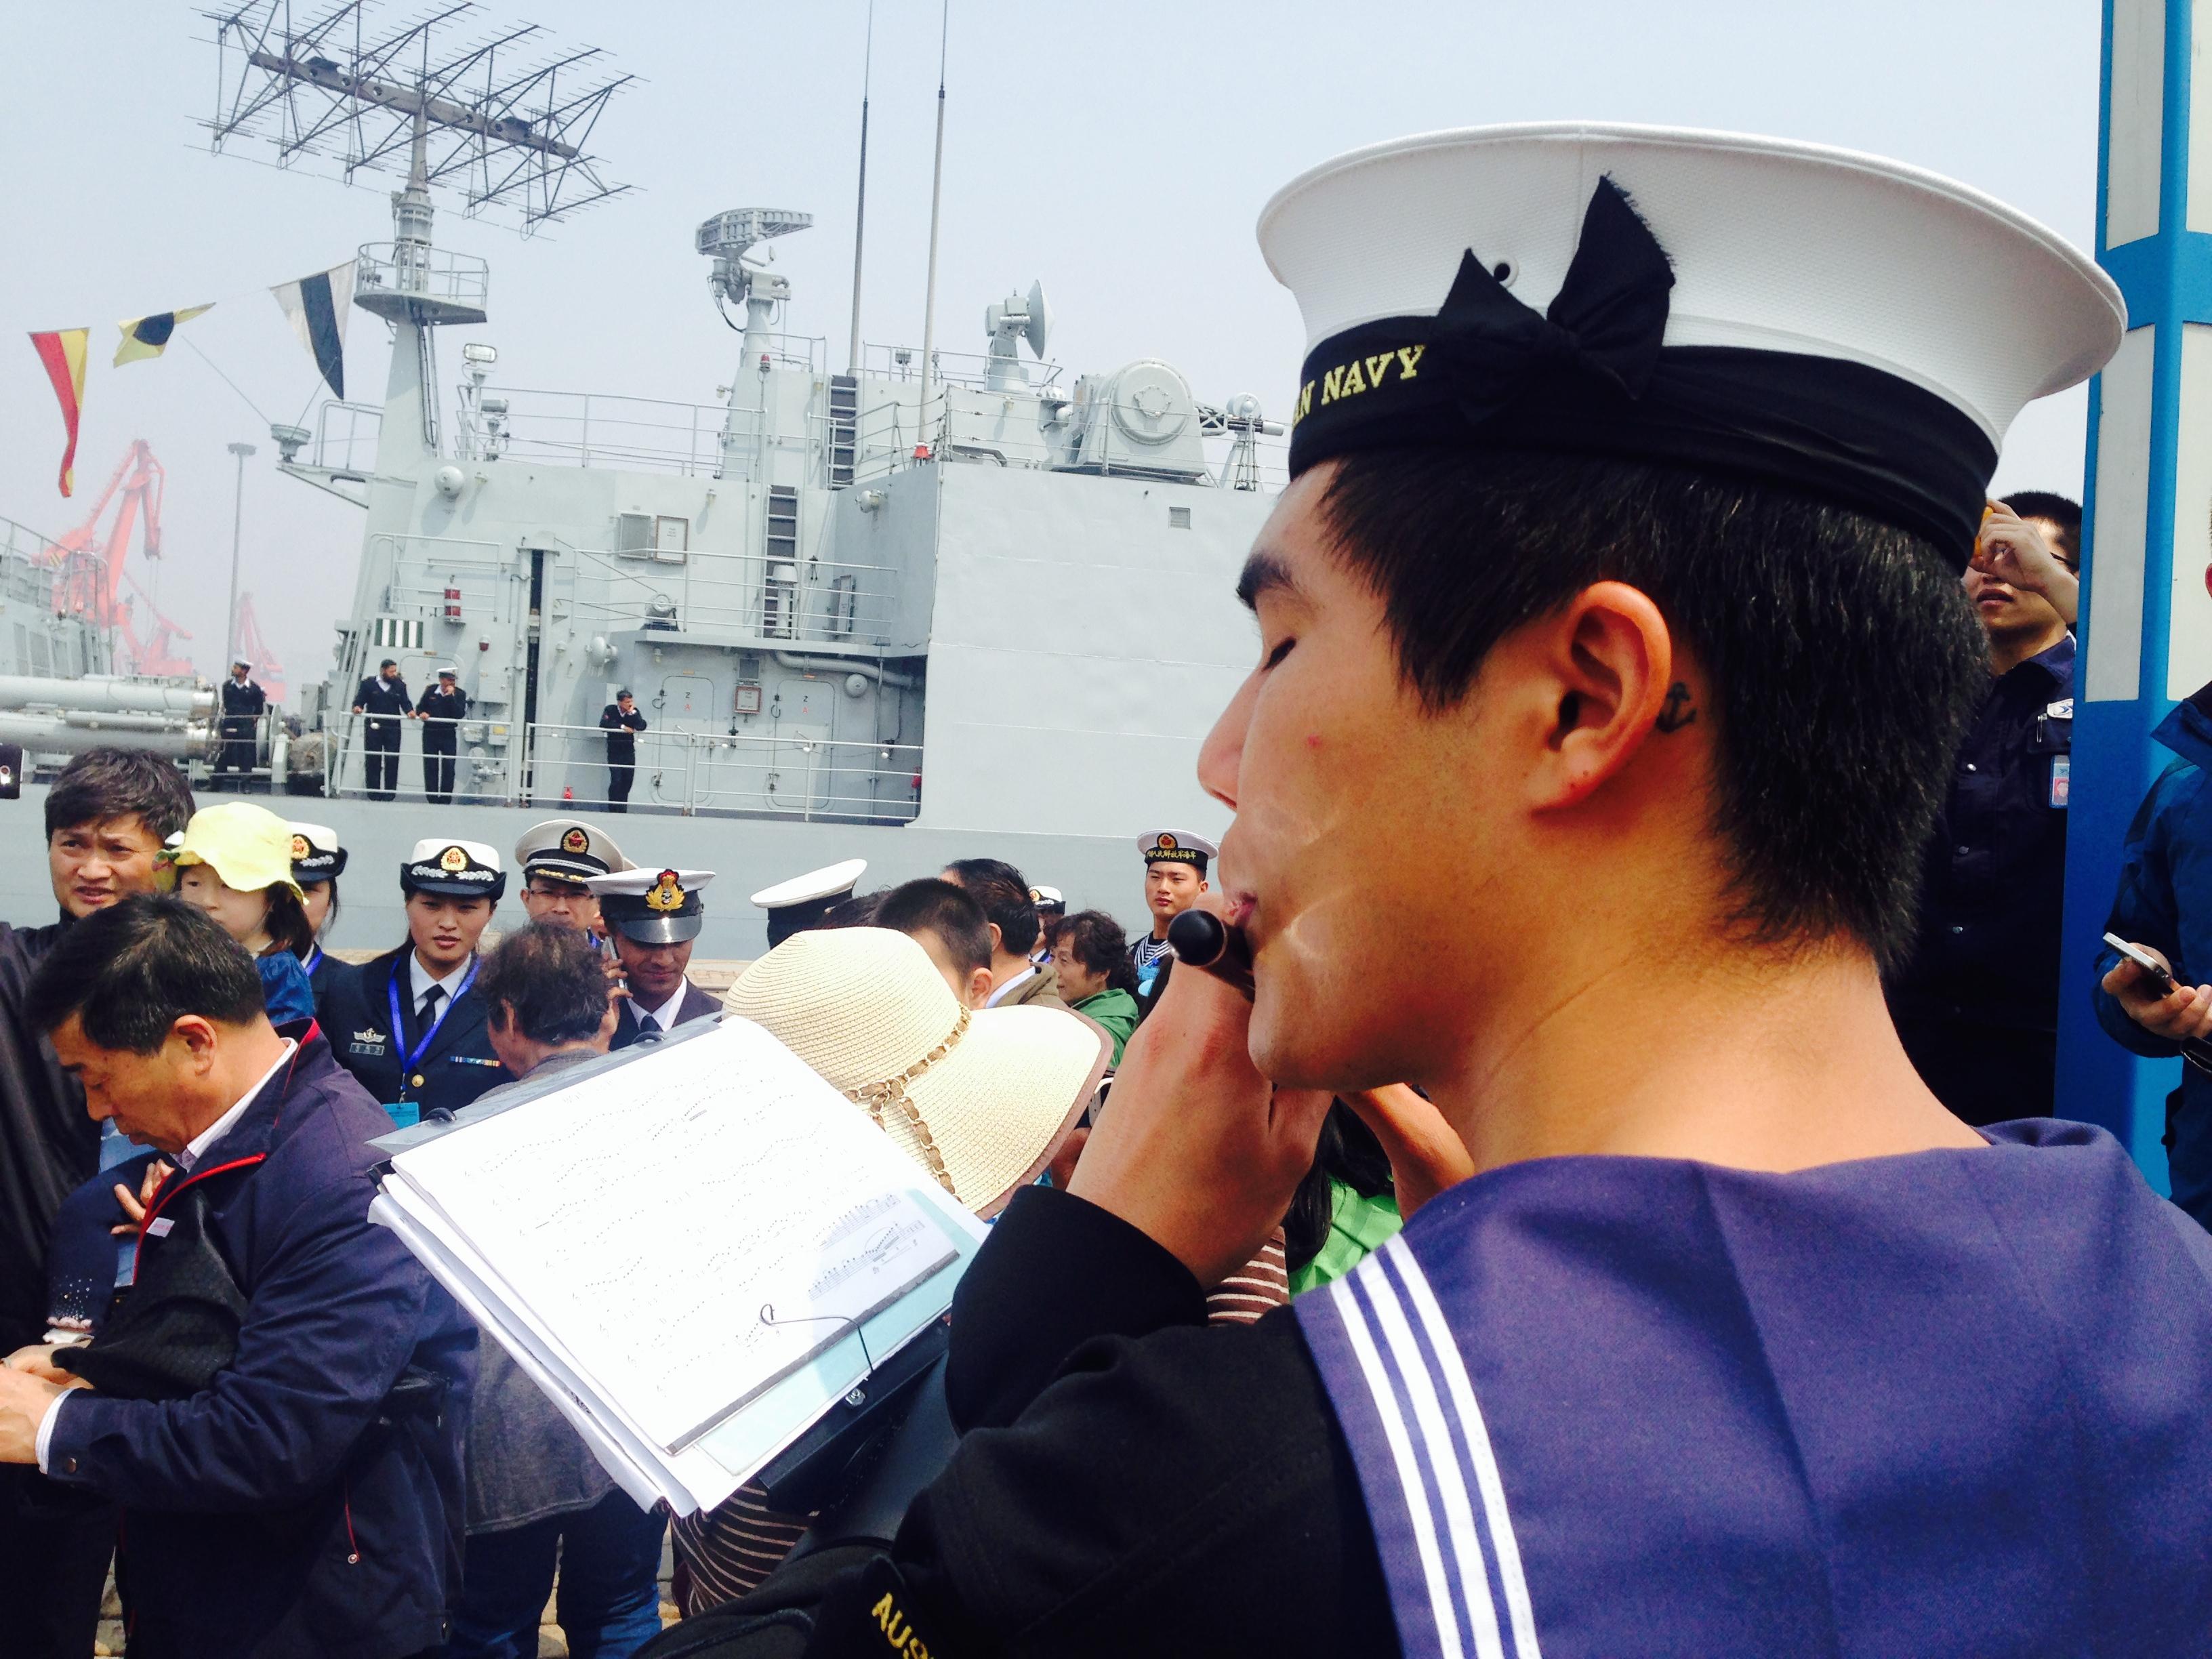 Western Pacific Naval Symposium